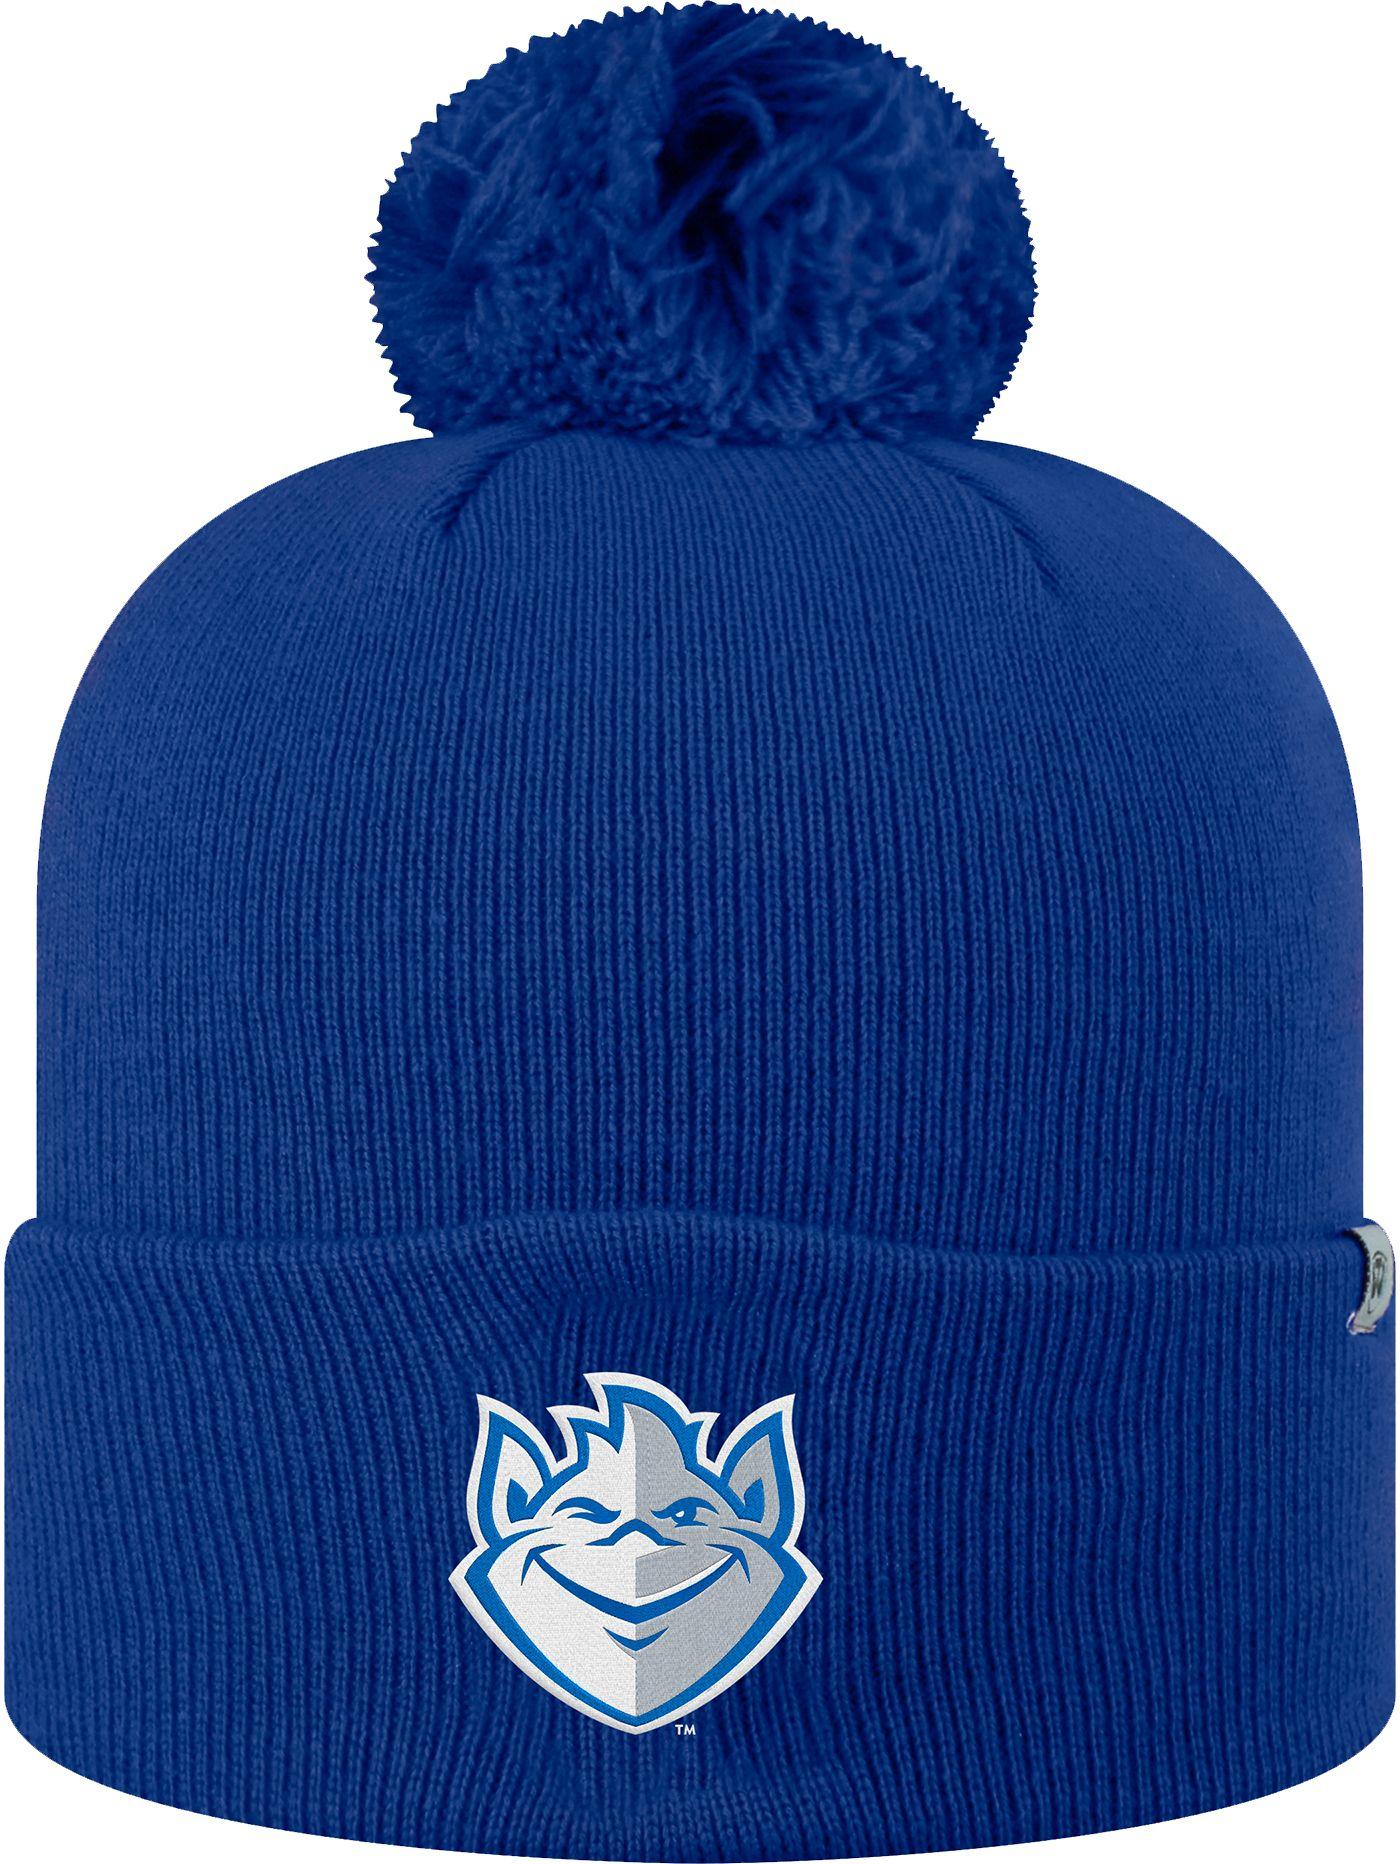 Top of the World Men's Saint Louis Billikens Blue Pom Knit Beanie